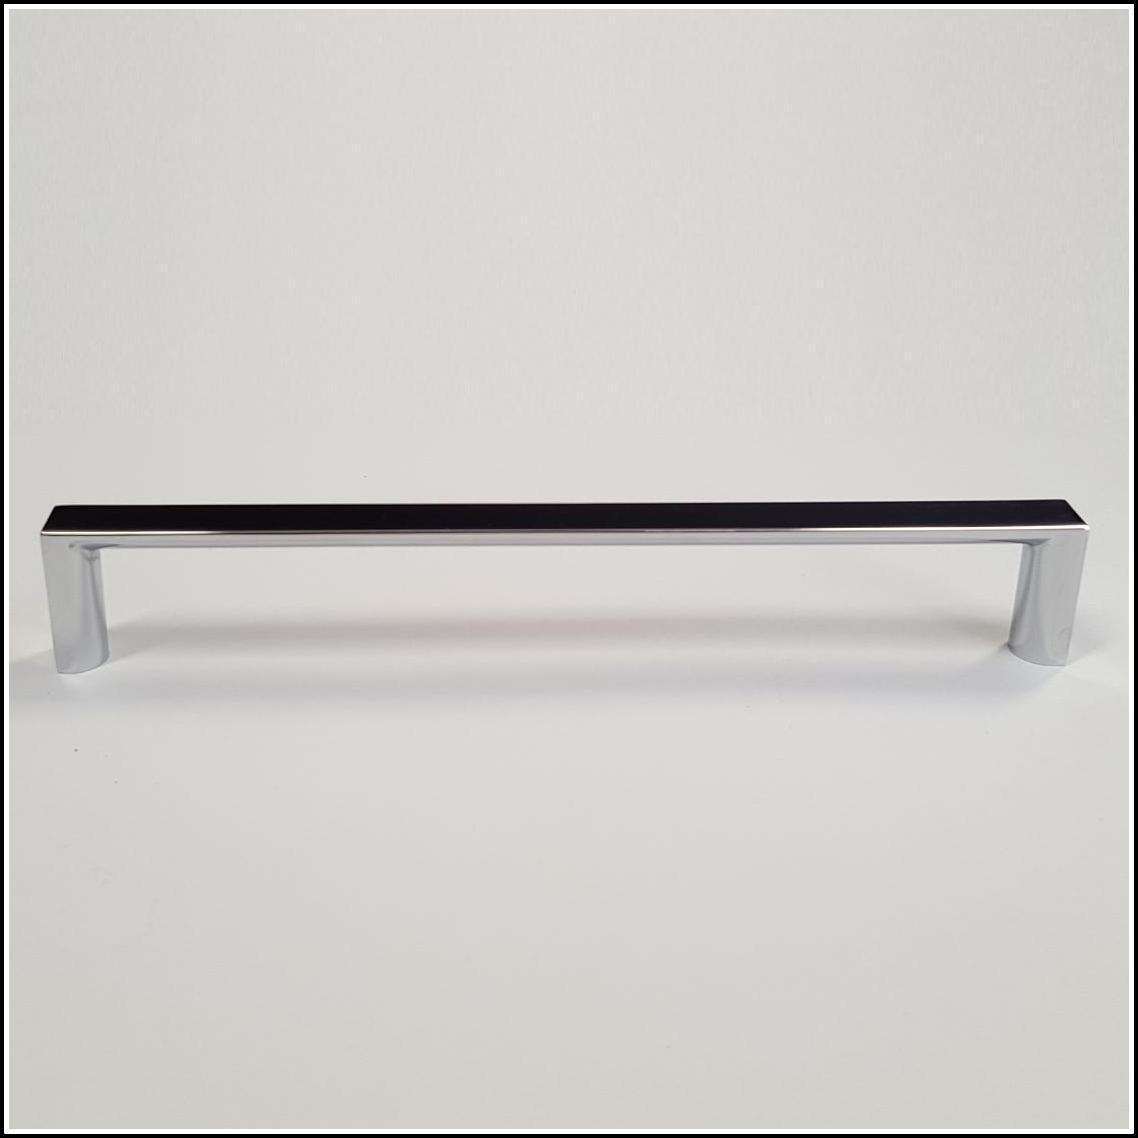 Polished Chrome D-Square Handle Pulls